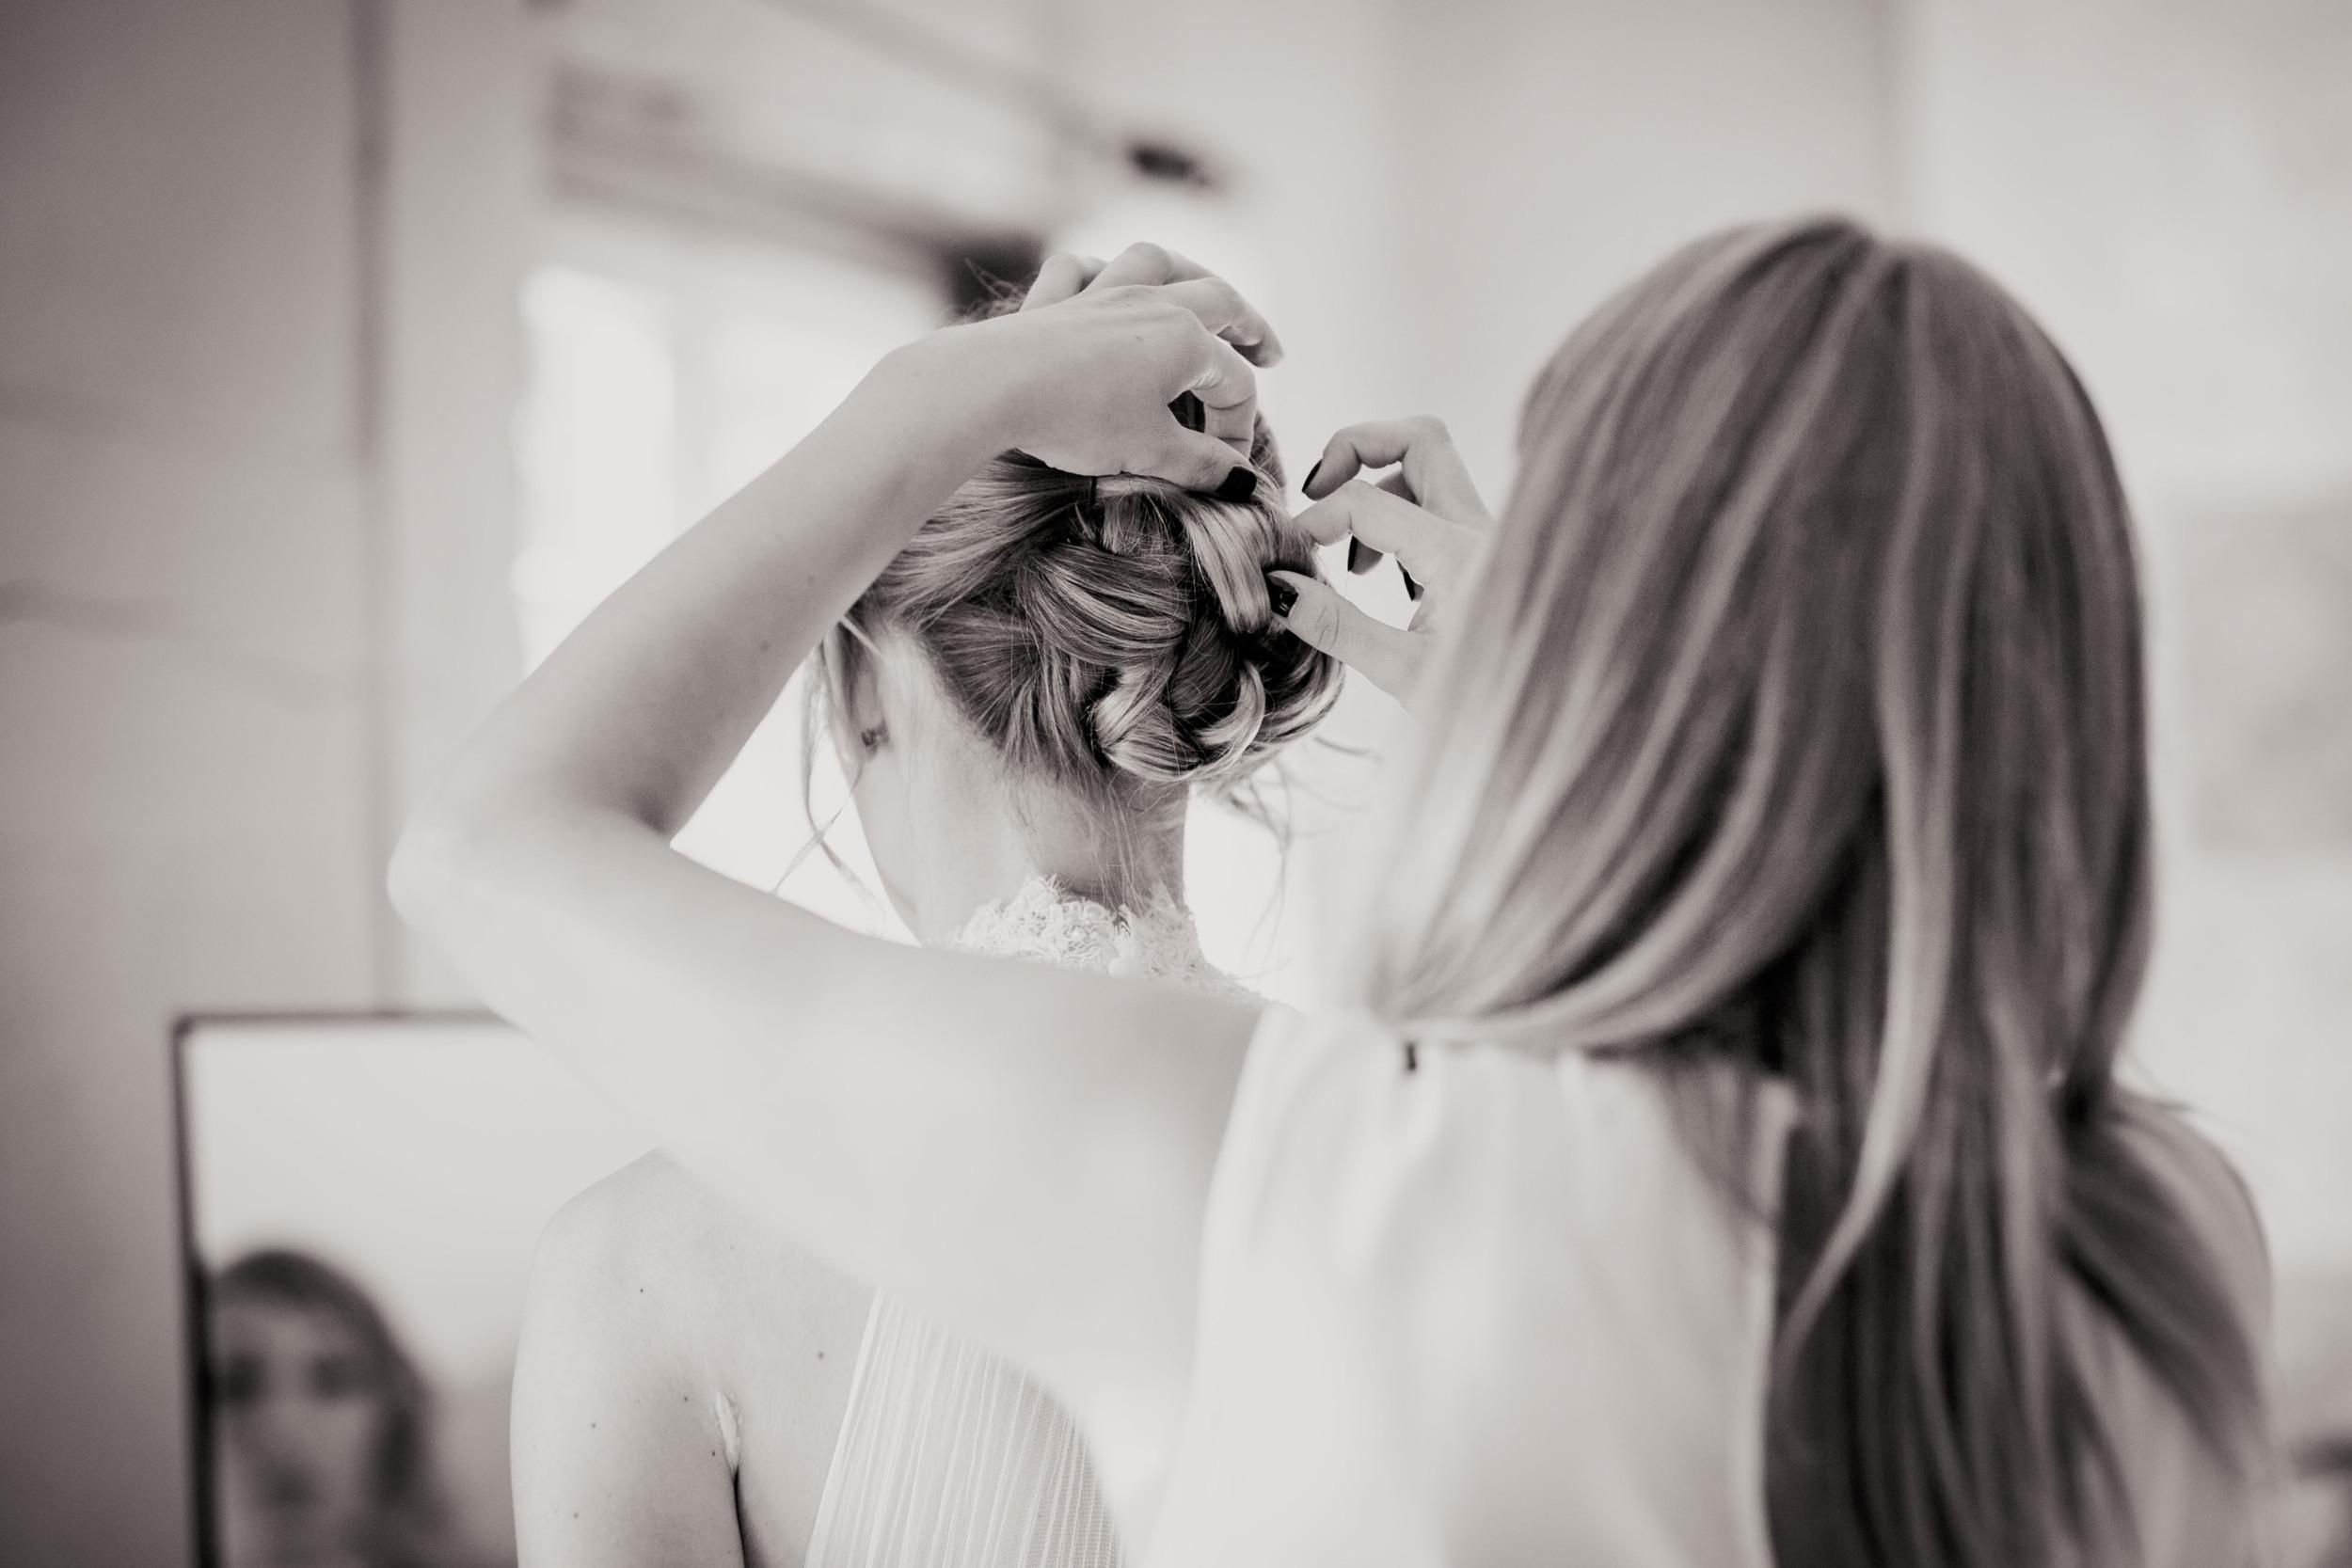 Fran Burrows Hochzeitsfotografie_Kulturgut Wrechen Hochzeit-9.jpg